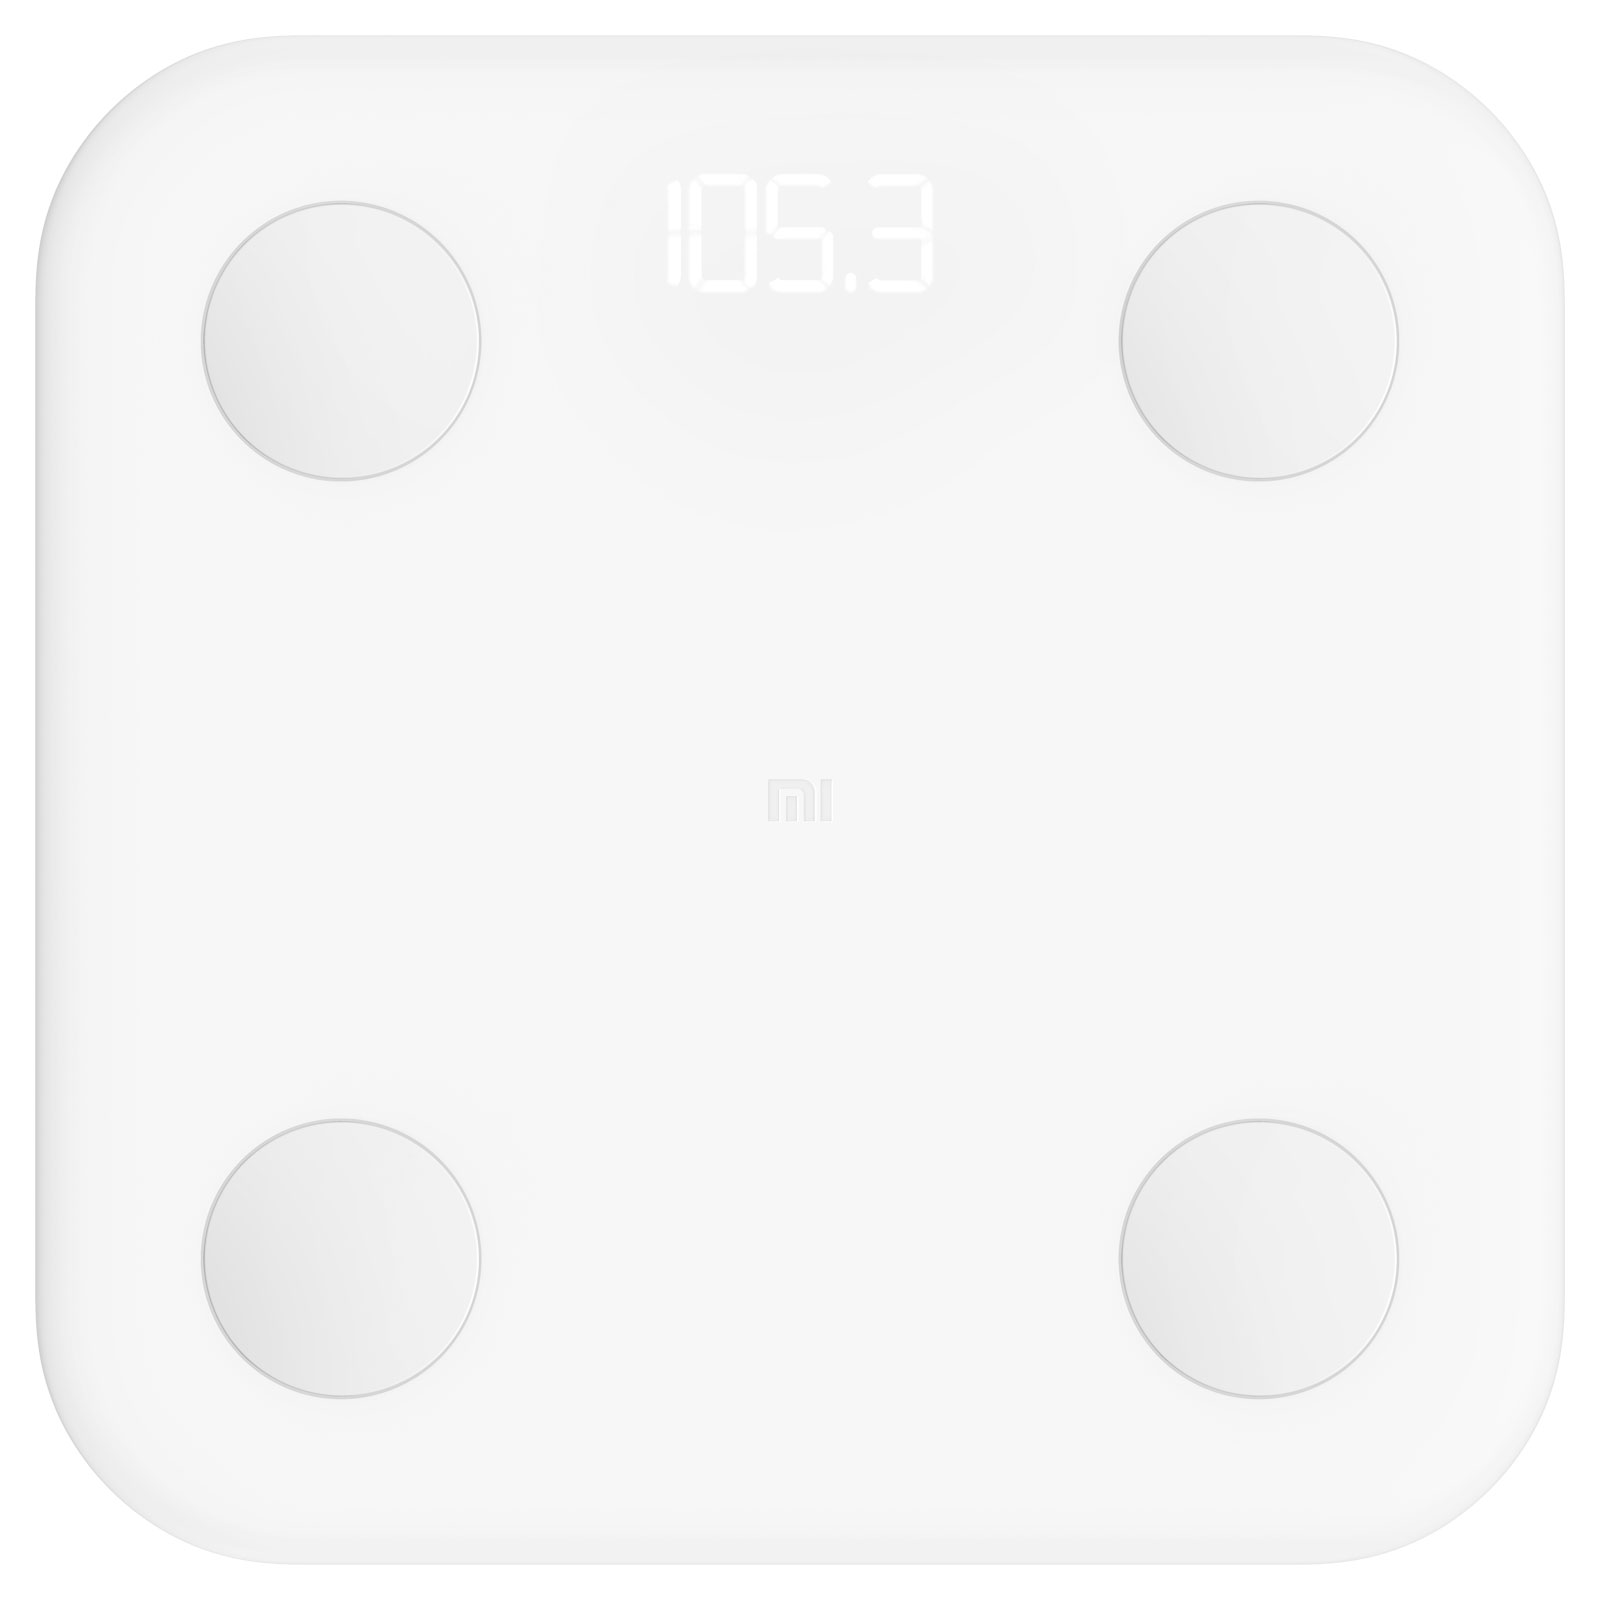 Balance connectée Xiaomi Mi Body Composition Scale Balance connectée avec composition corporelle, sauvegarde 16 utilisateurs, Bluetooth (iOS et Android)